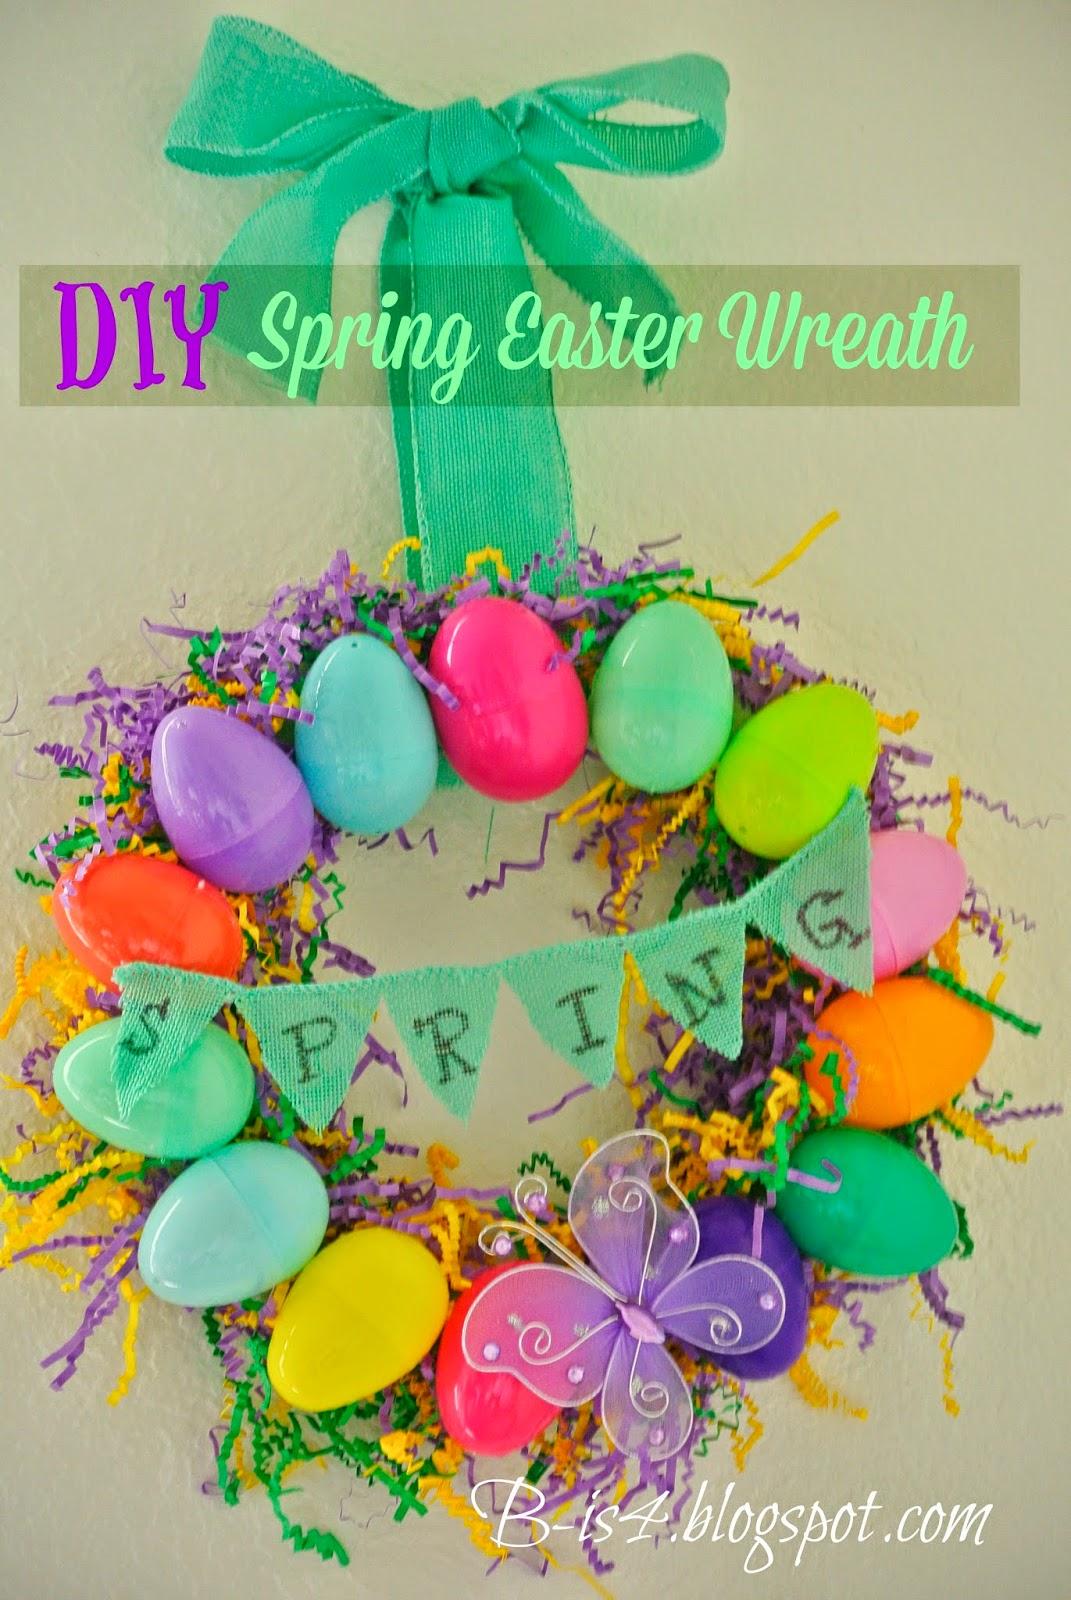 DIY Easter Egg Spring Wreath